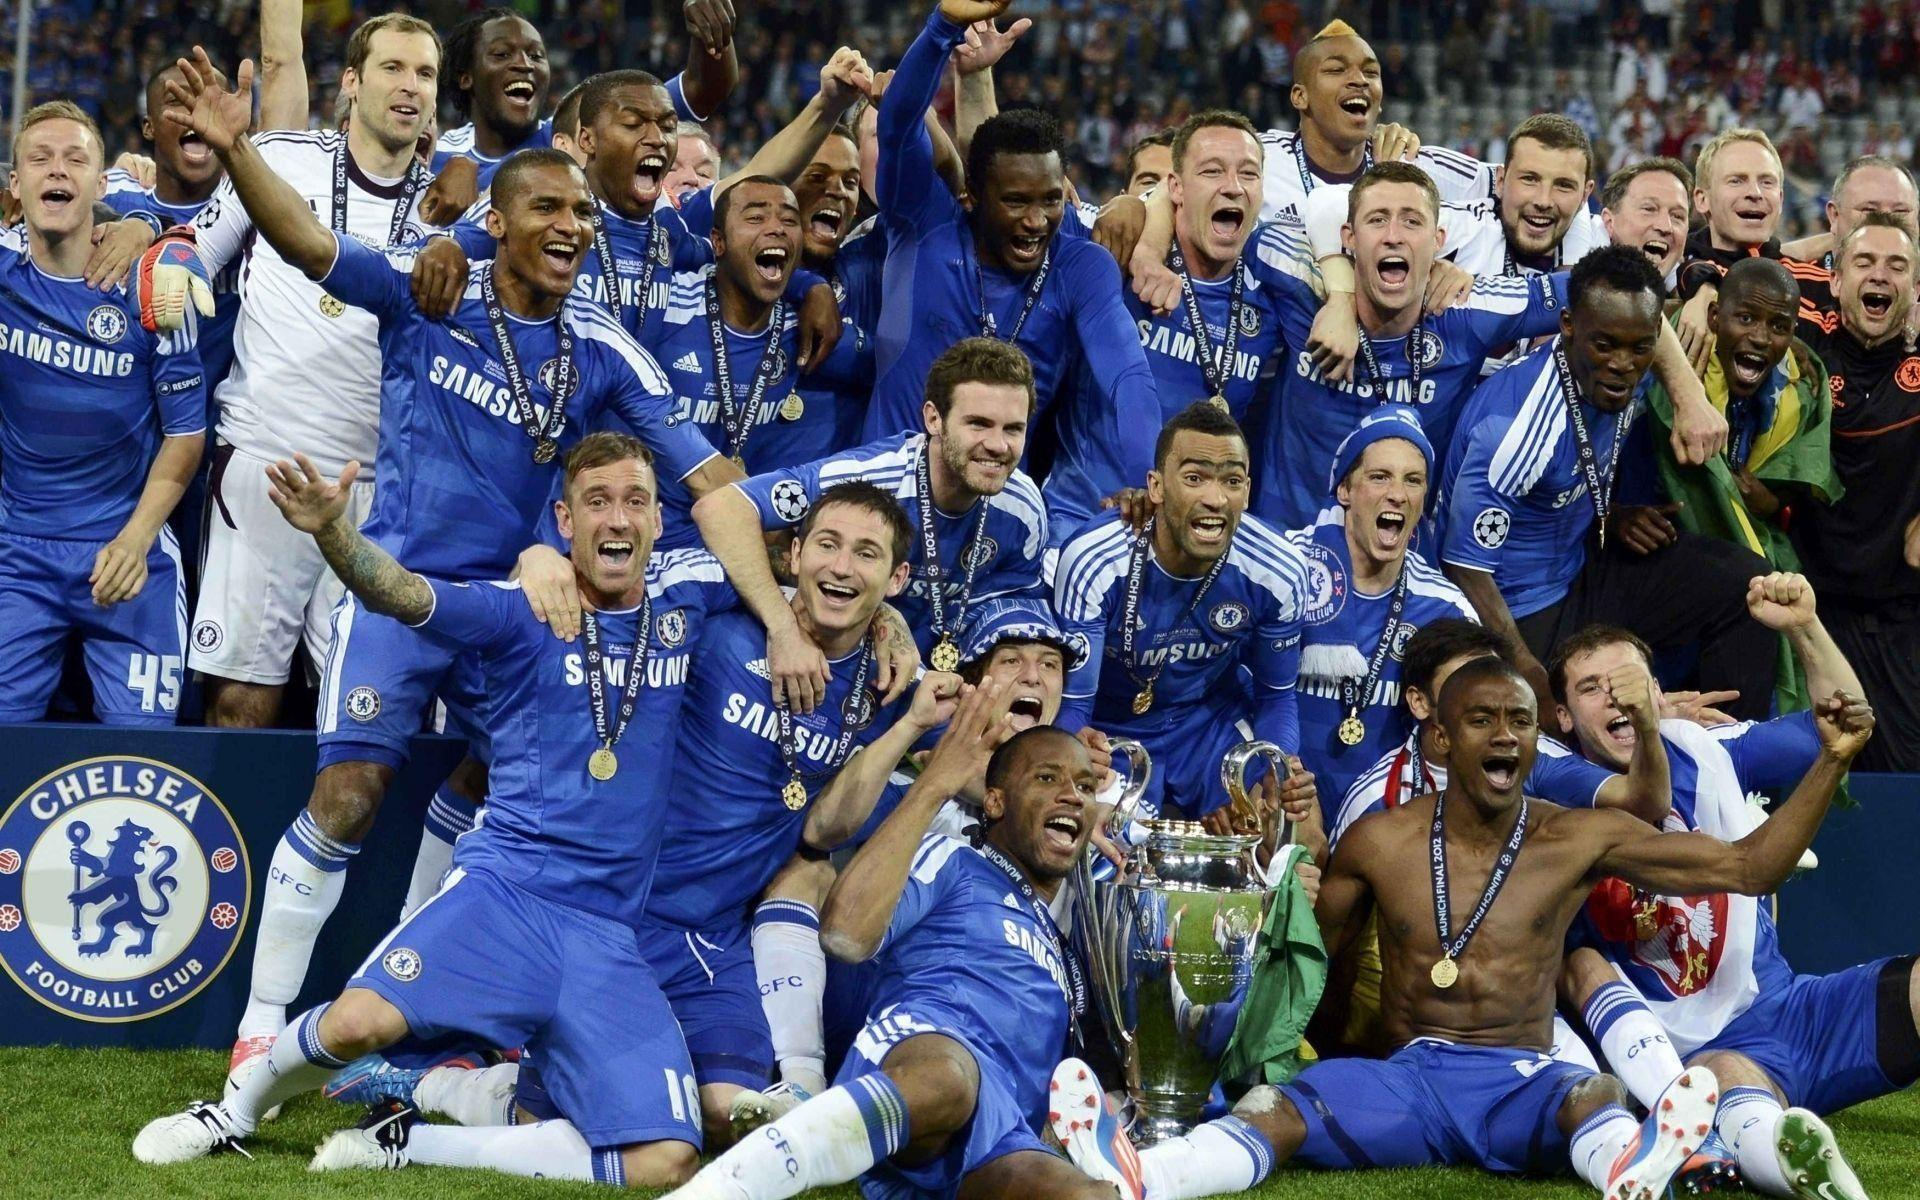 Chelsea FC Champions League Wallpaper | Wallpaper Download